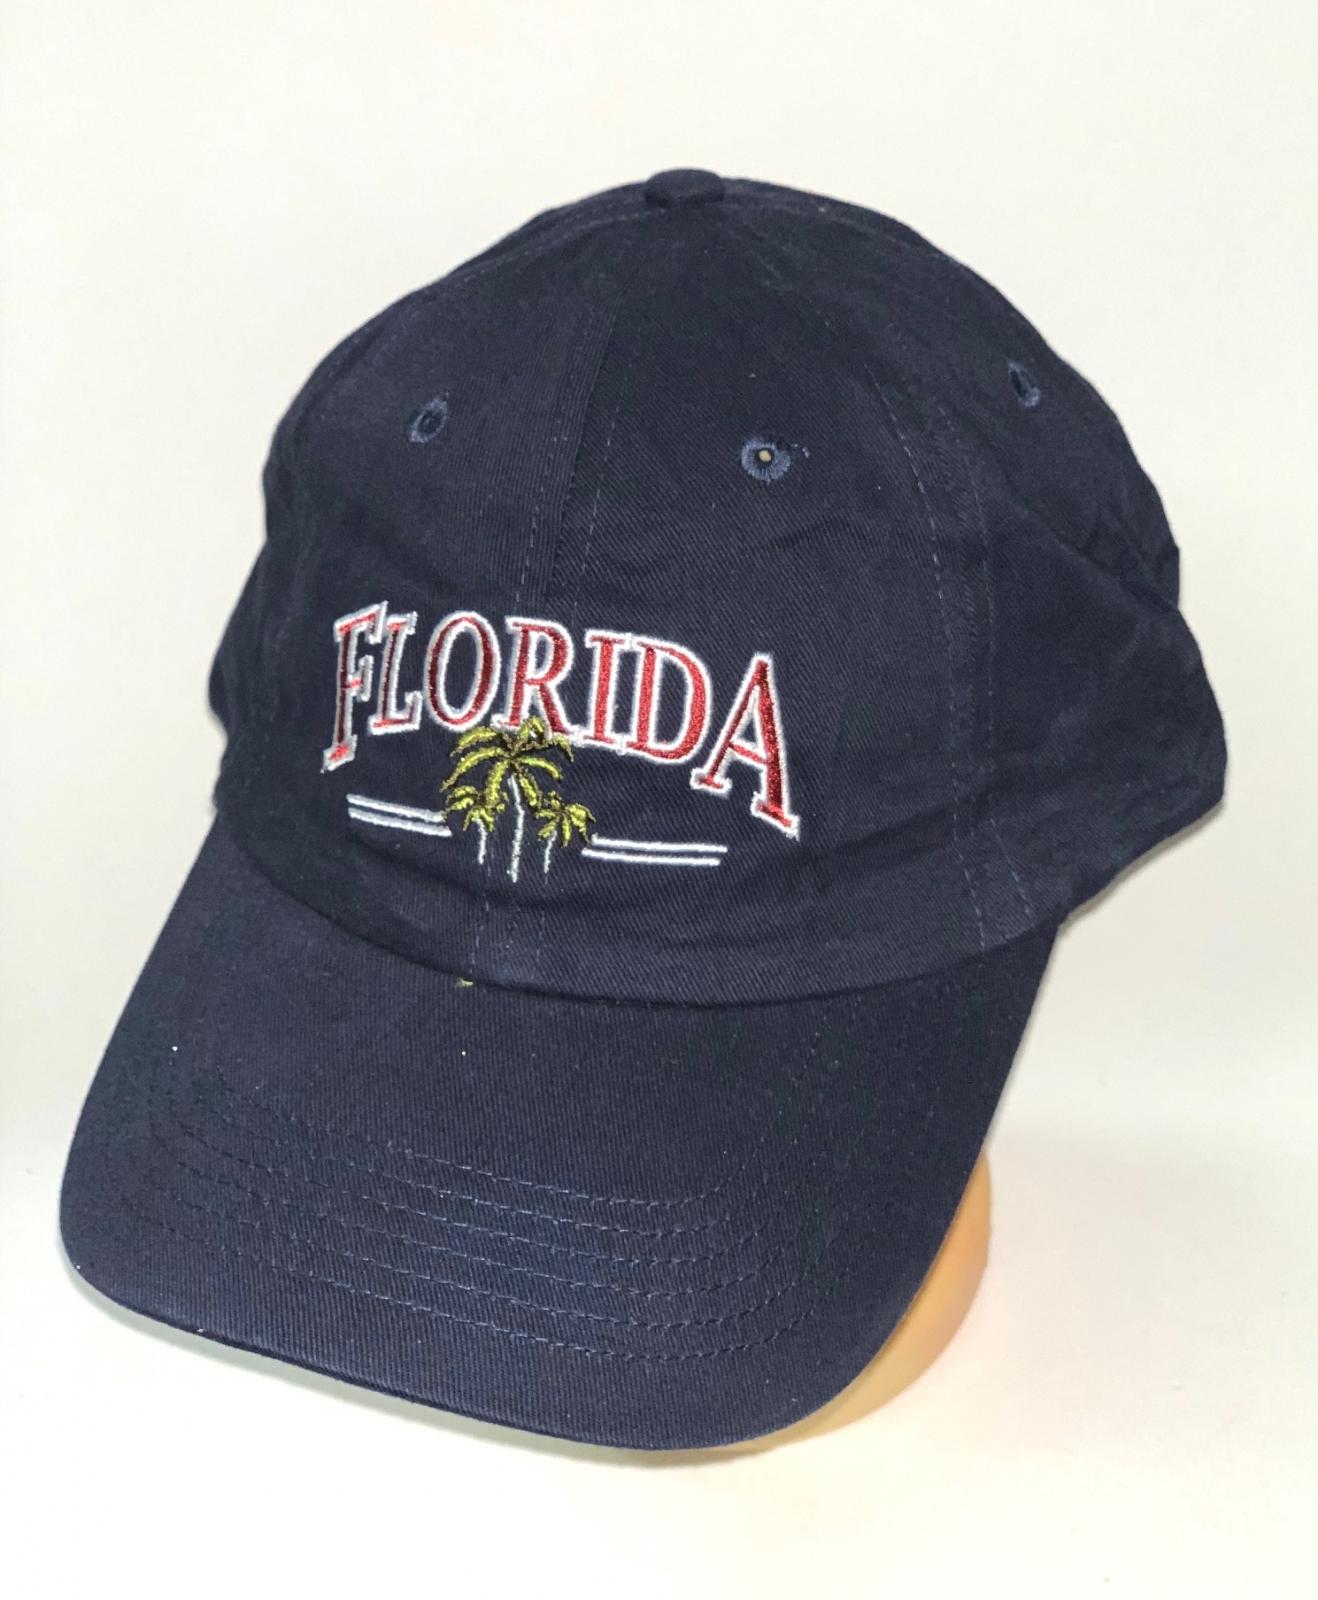 Темно-синяя бейсболка Florida